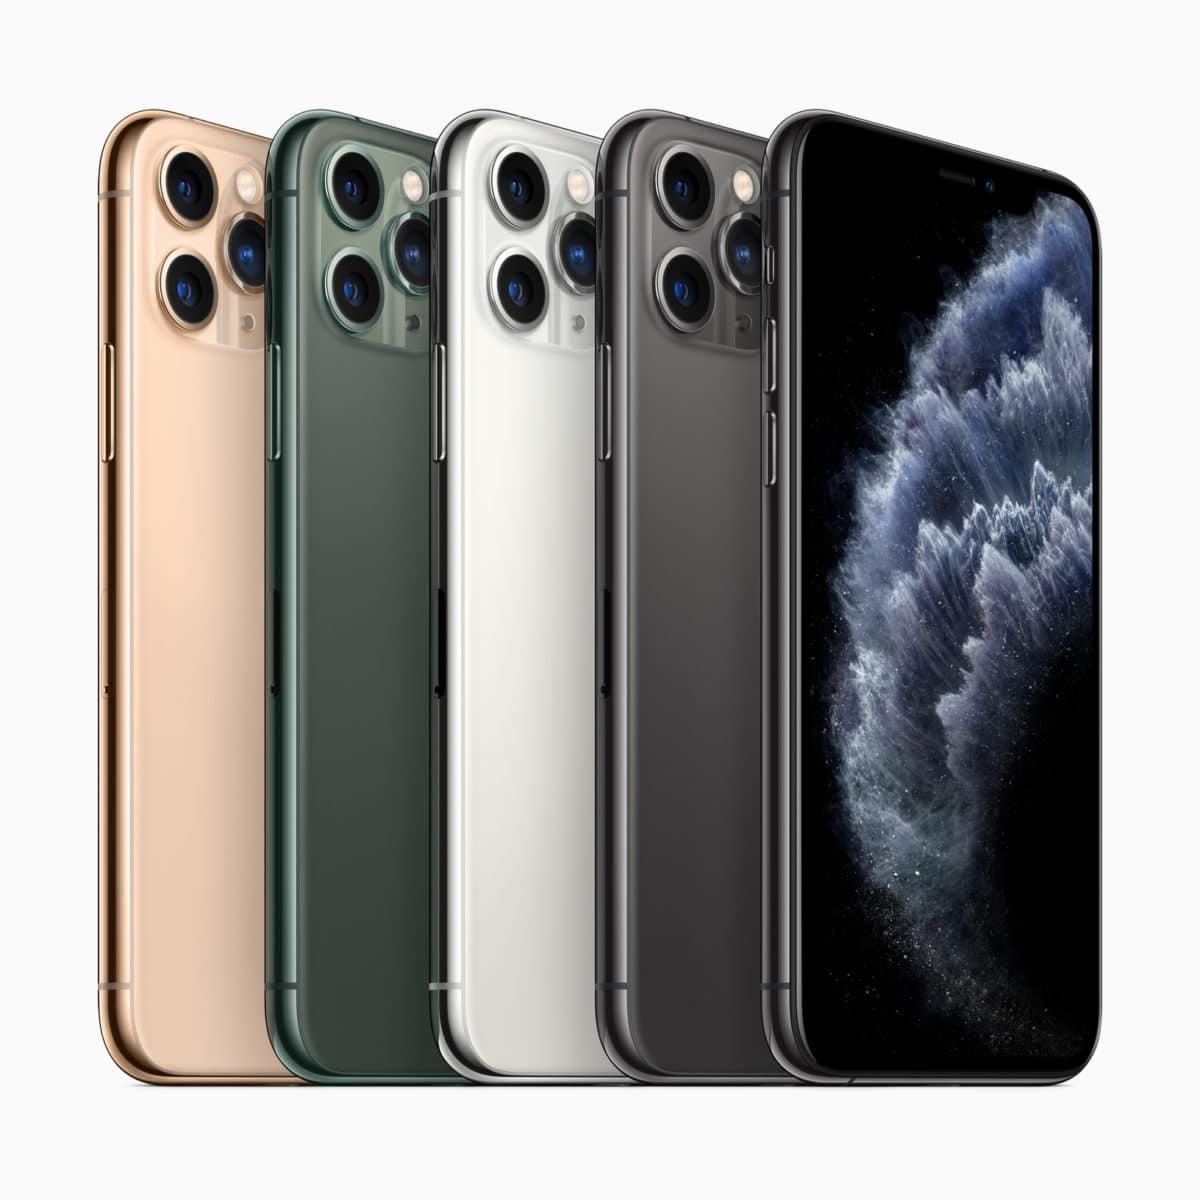 Apple_iPhone-11-Pro_Colors_091019-1 (1)